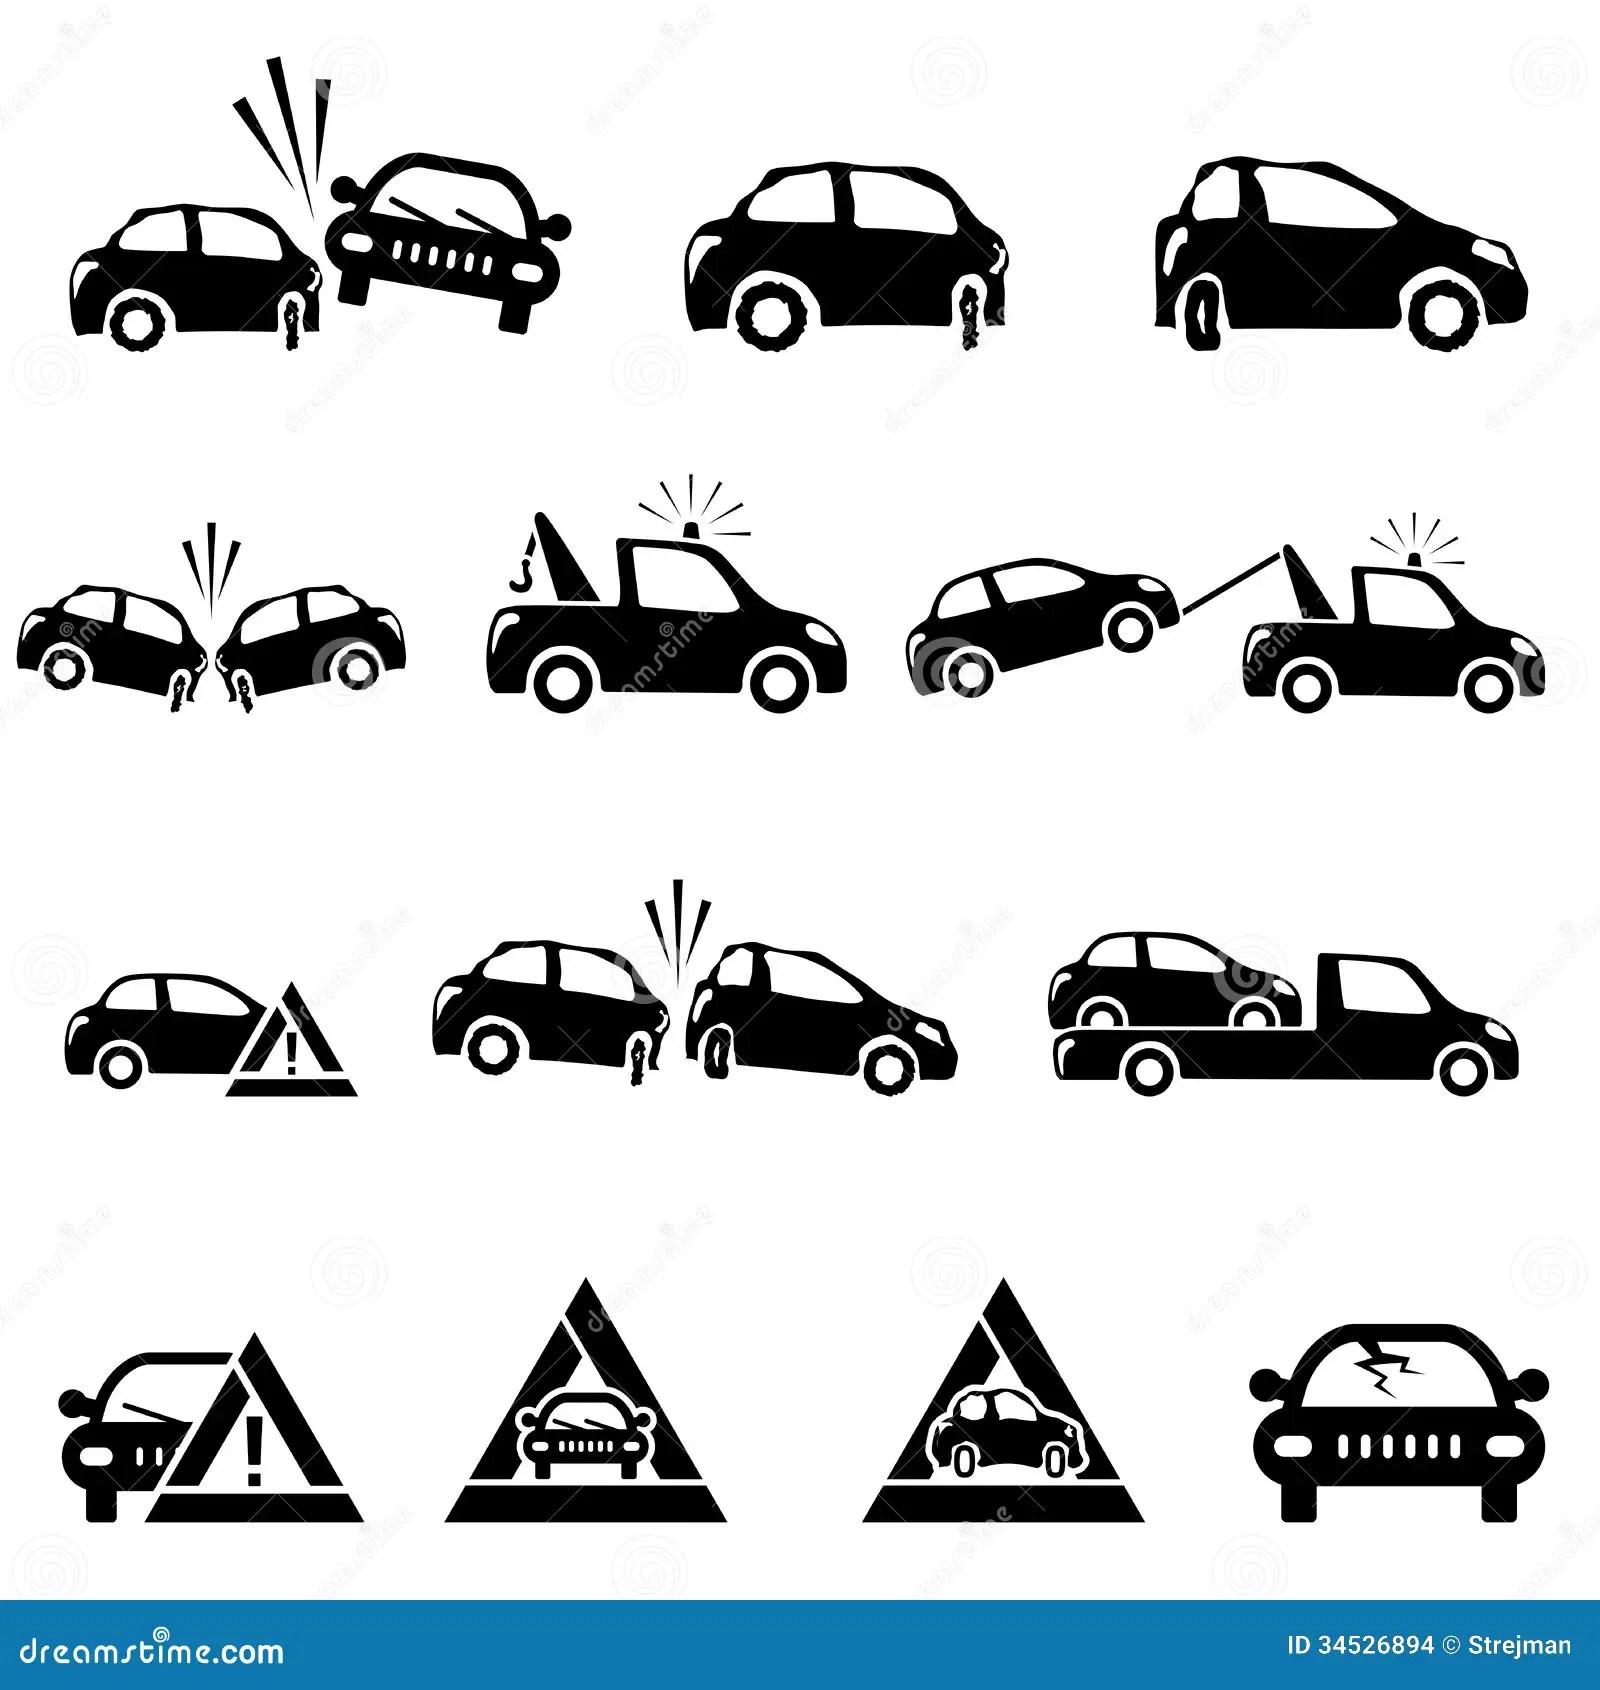 Icones Reglees De L Accident De Voiture Images Stock